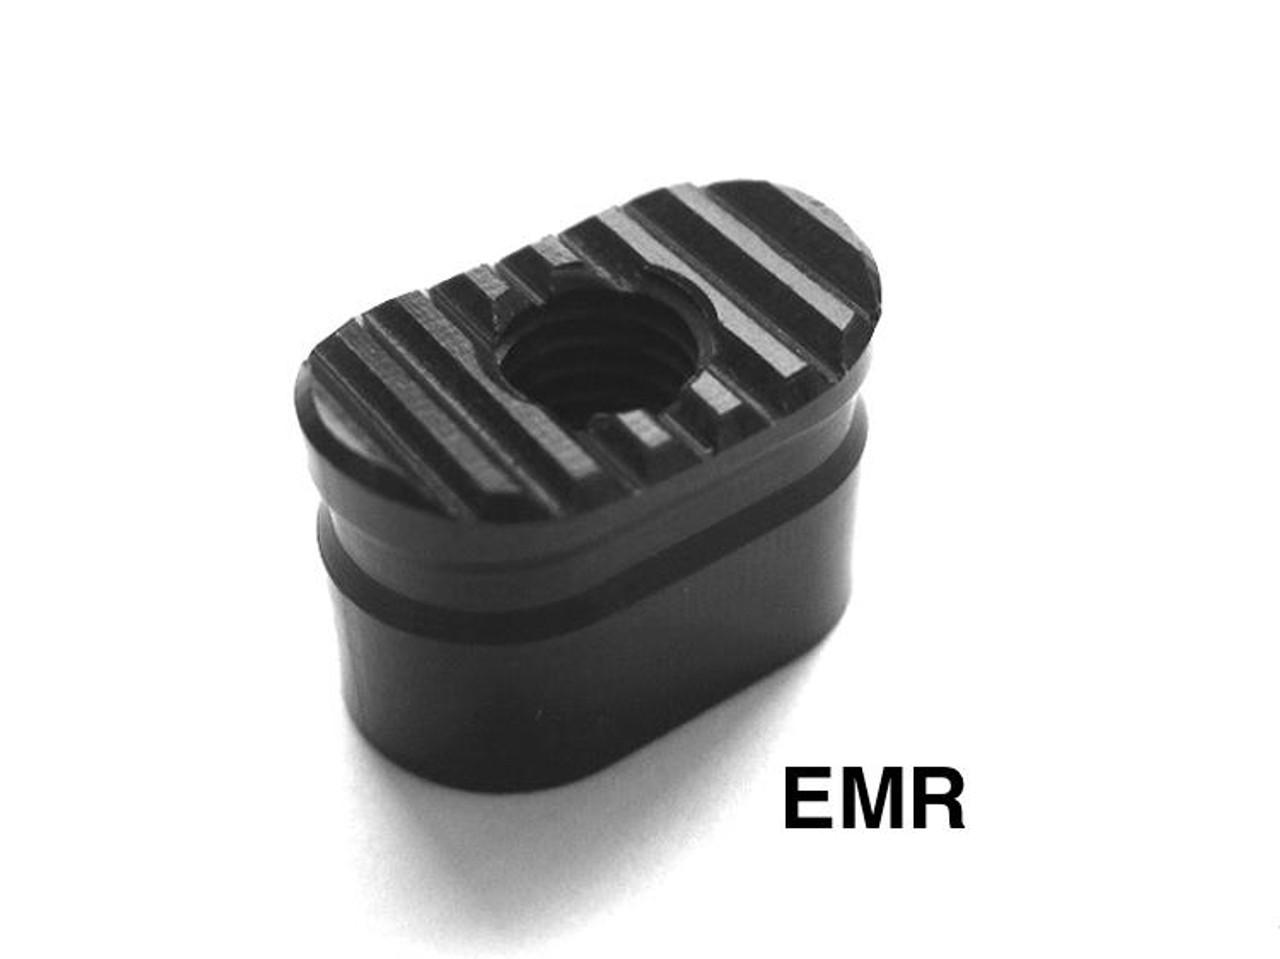 Forward Controls Design Enhanced Magazine Release - EMR